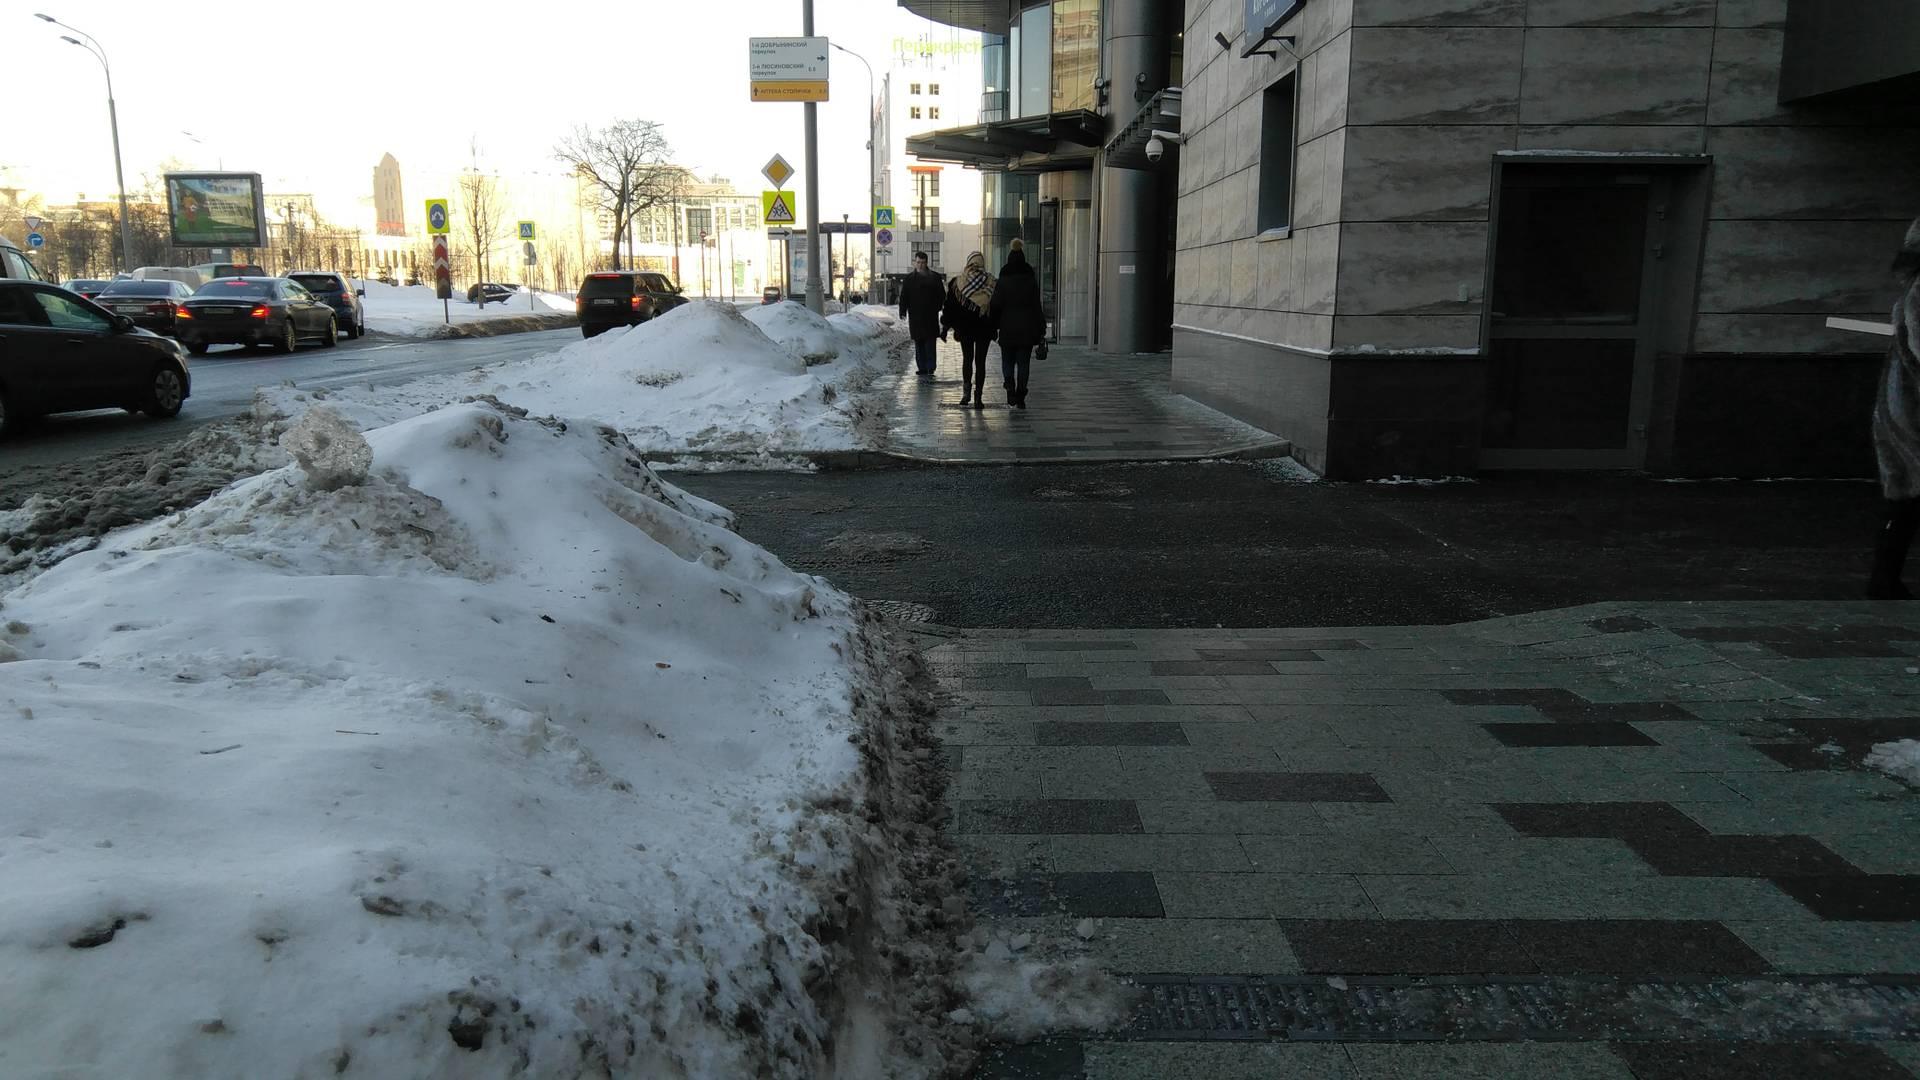 Москва, ул. Коровий вал, противоположная сторона